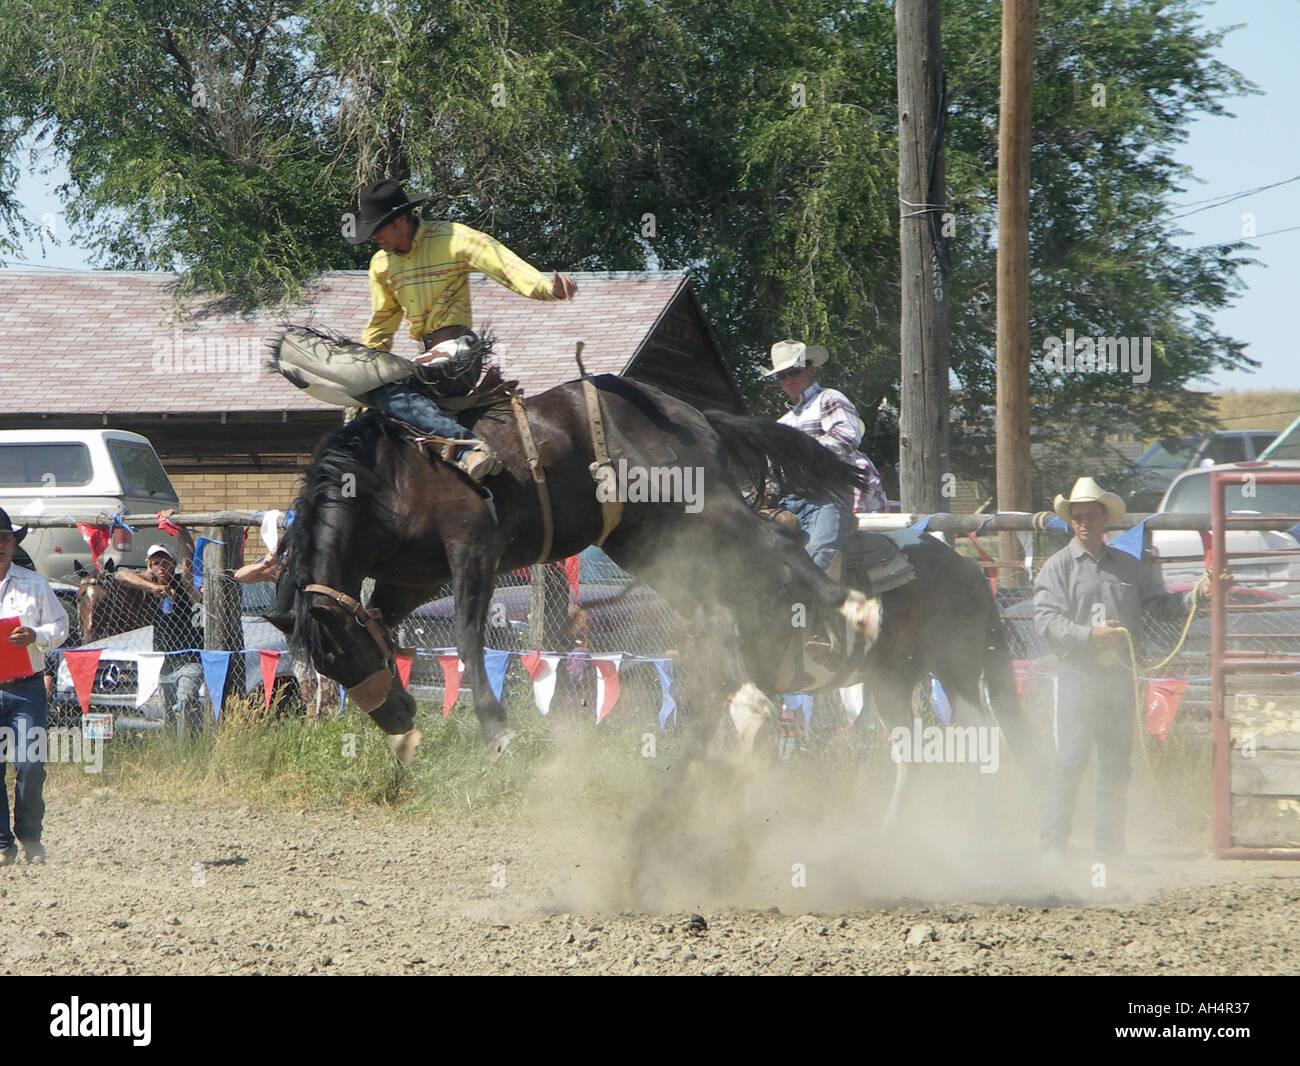 'bareback riding' - Stock Image